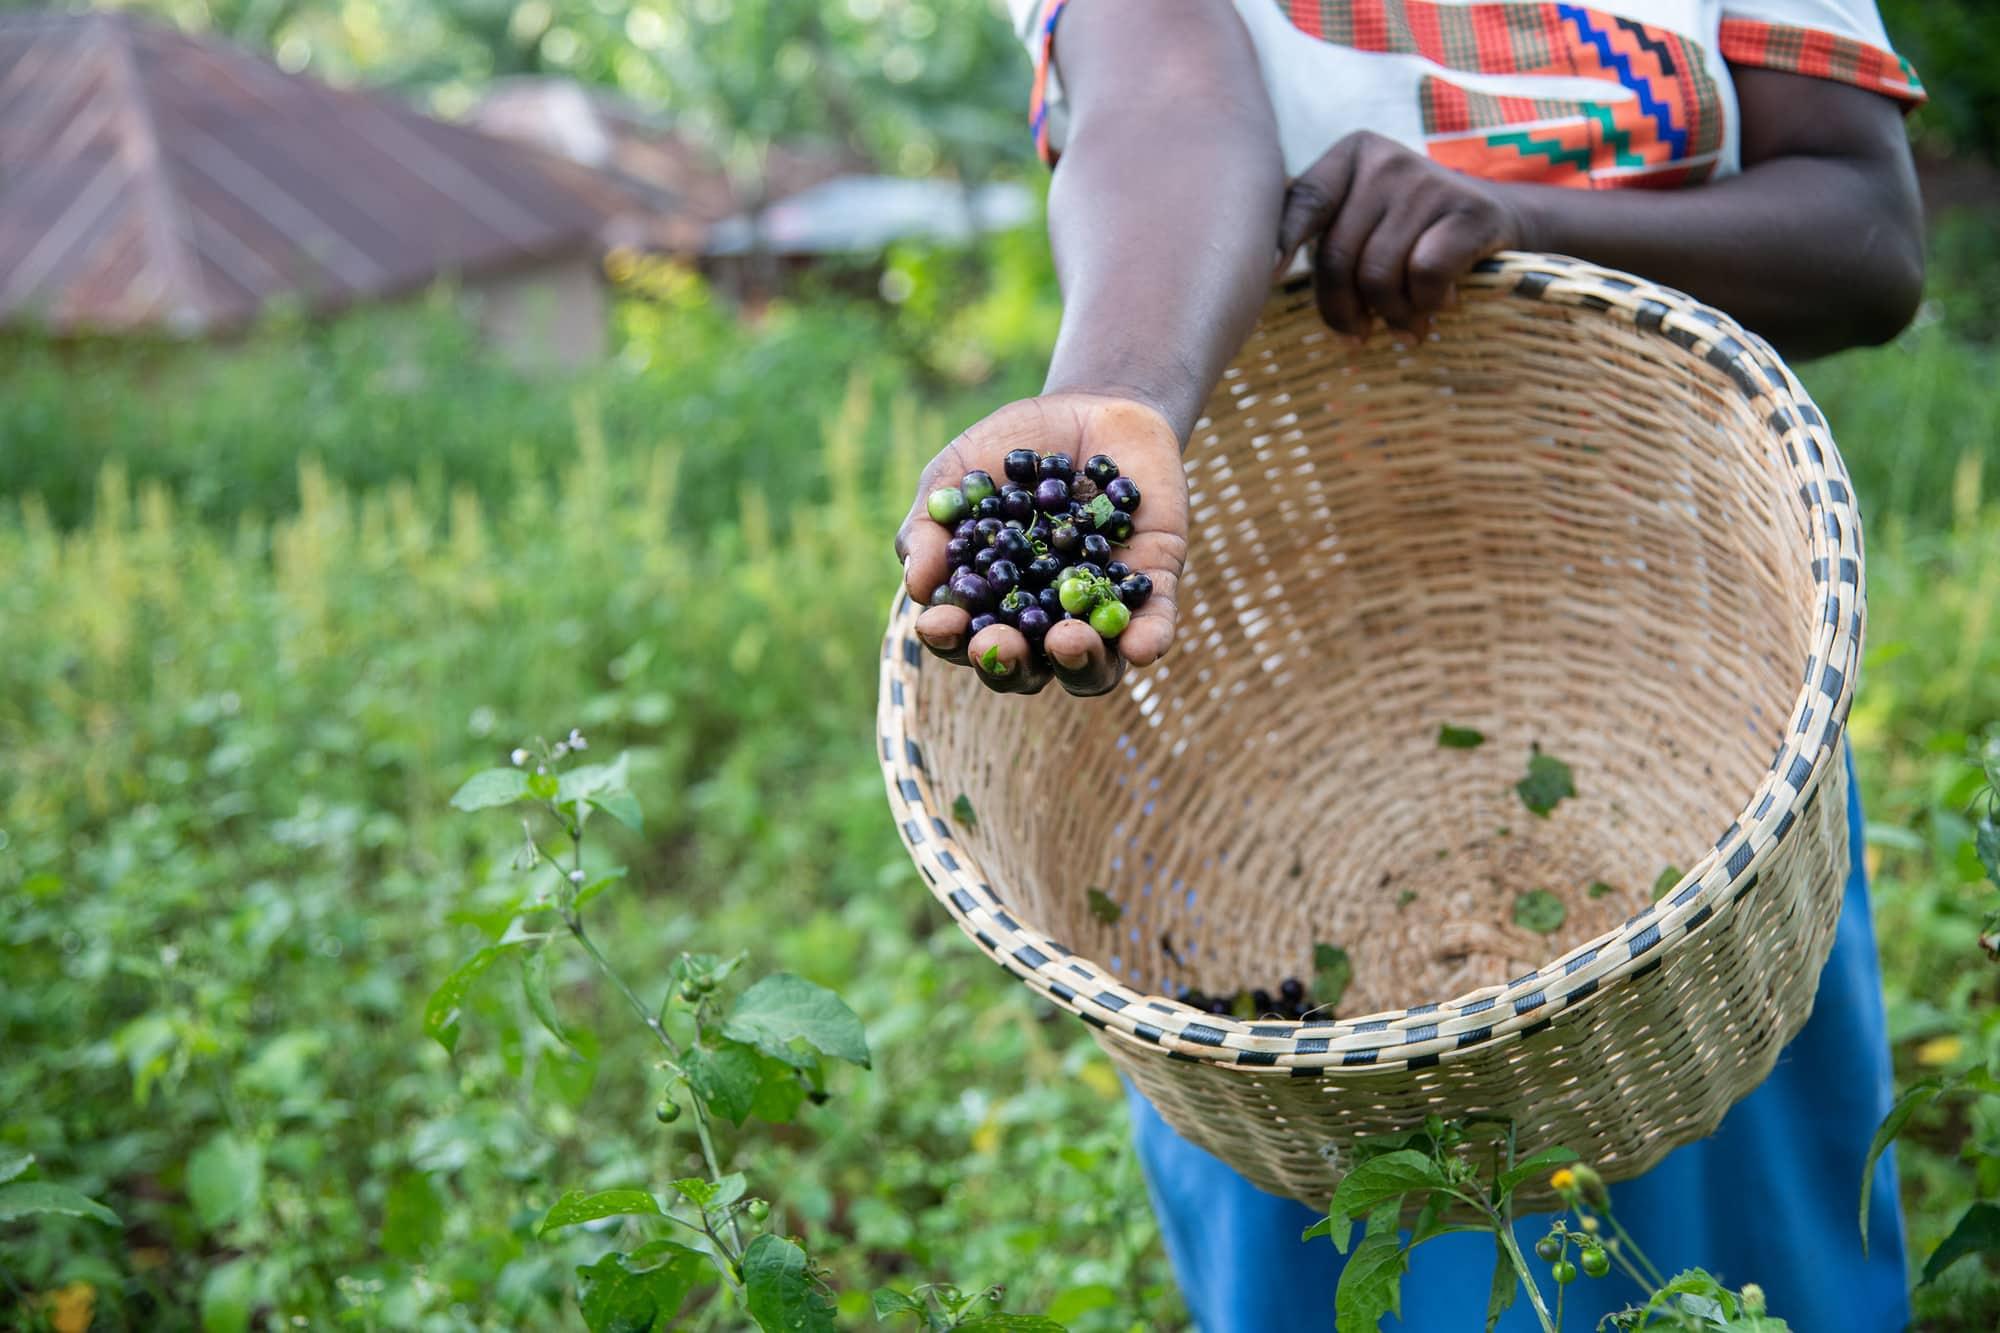 SeEdQUAL: Delivering Genetic Gains in Farmers' Fields